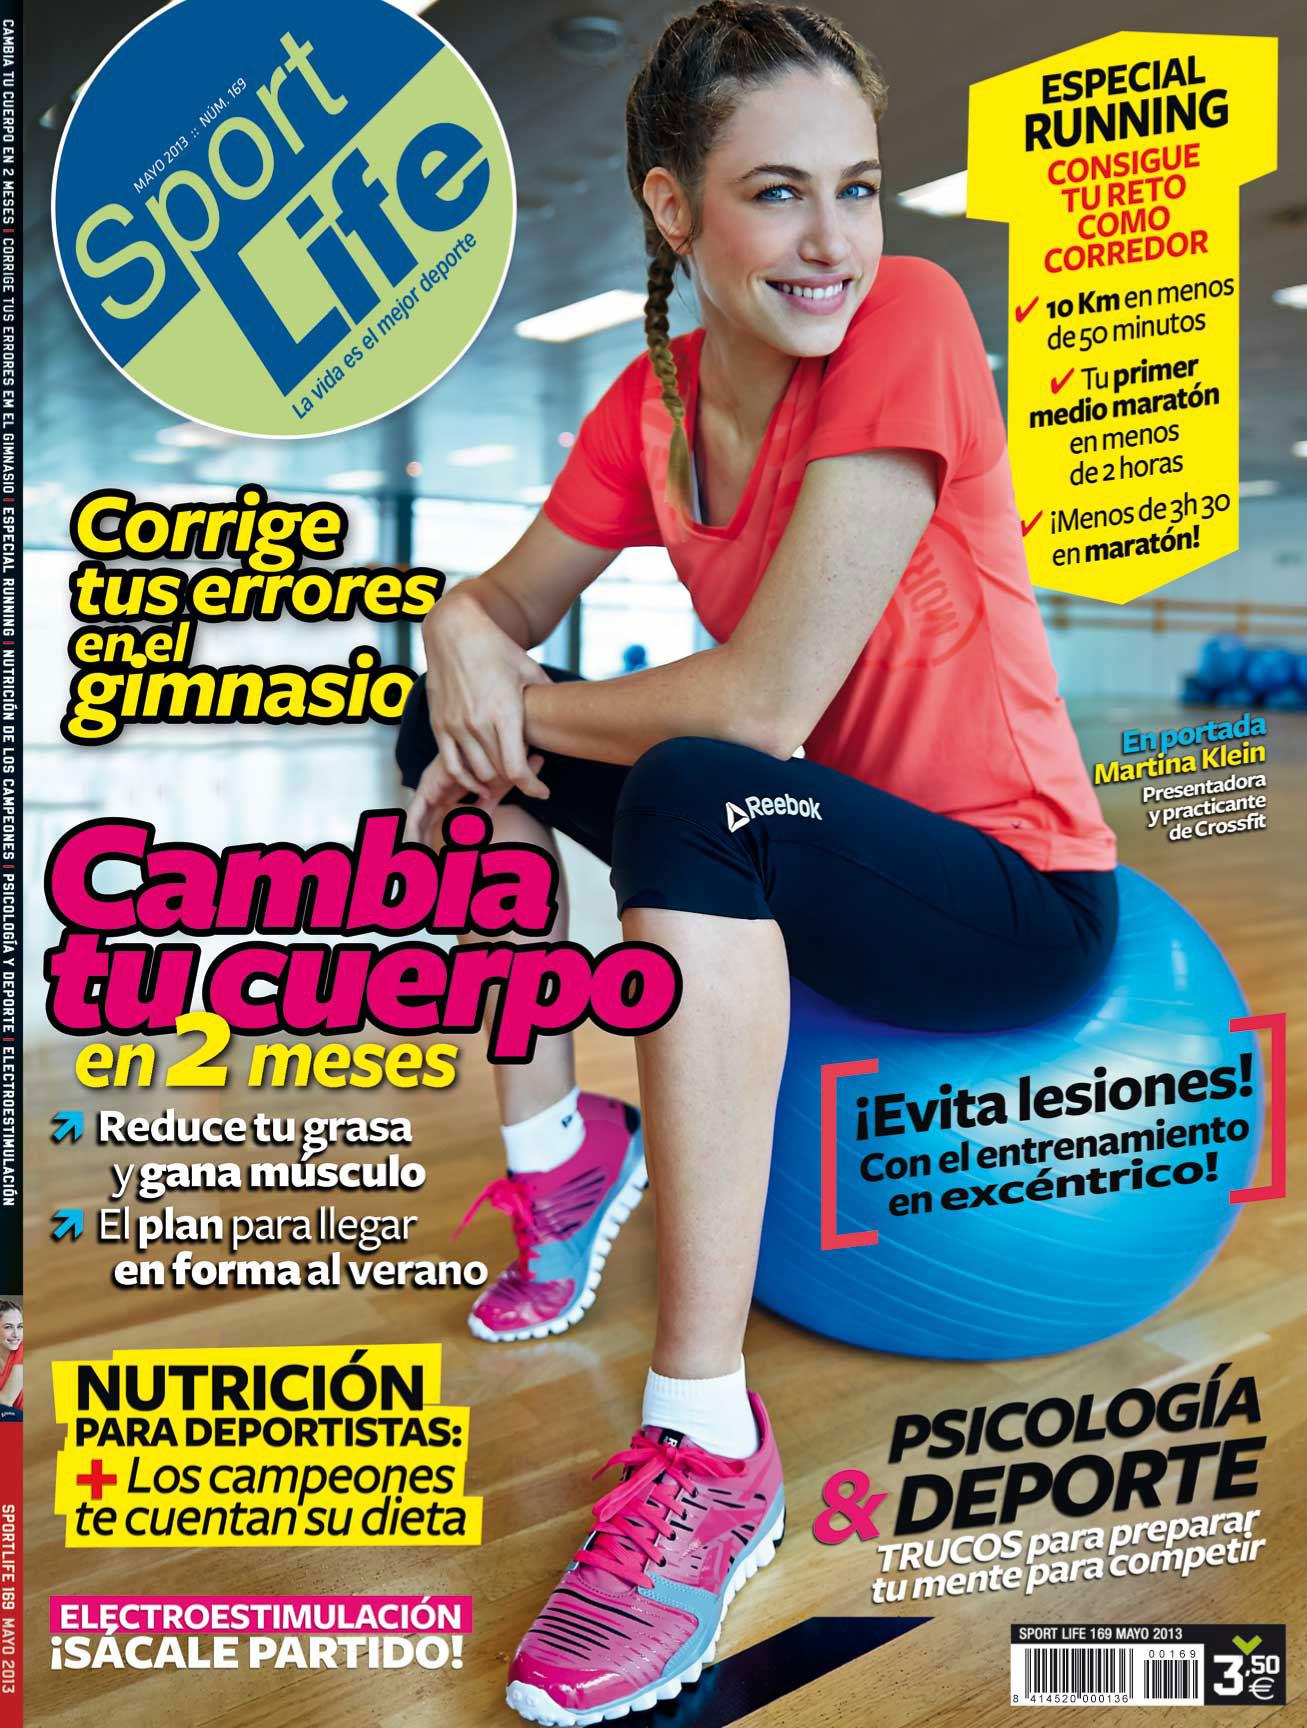 Sumario Sport Life 169 mayo 2013